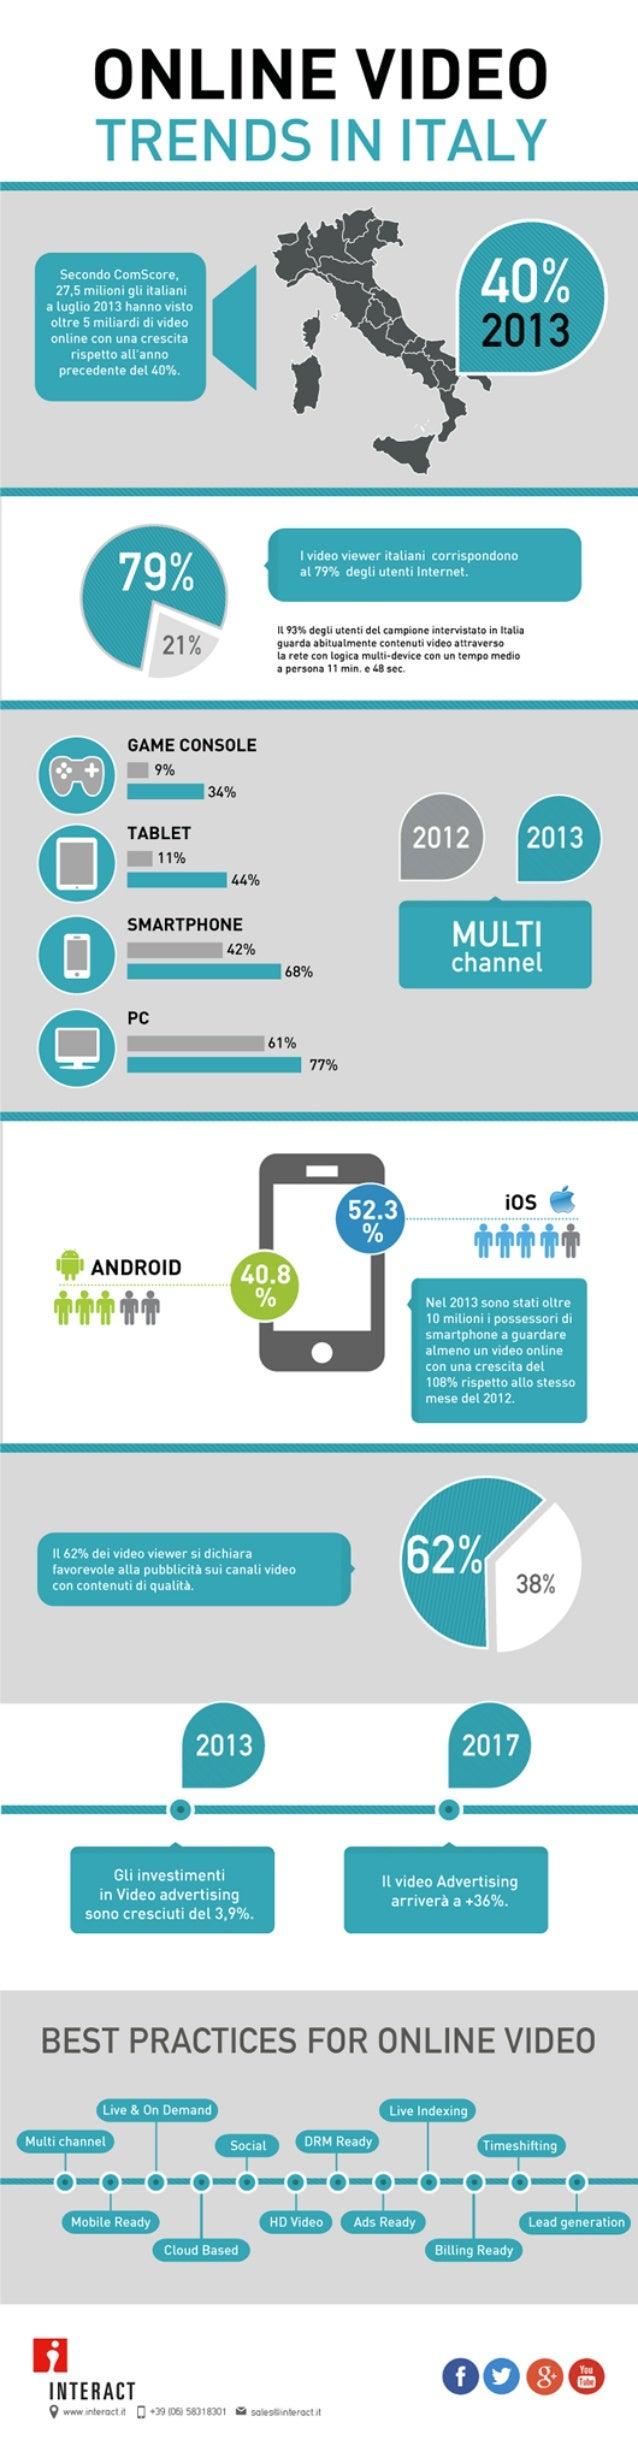 Video online in Italia - infografica sui trend